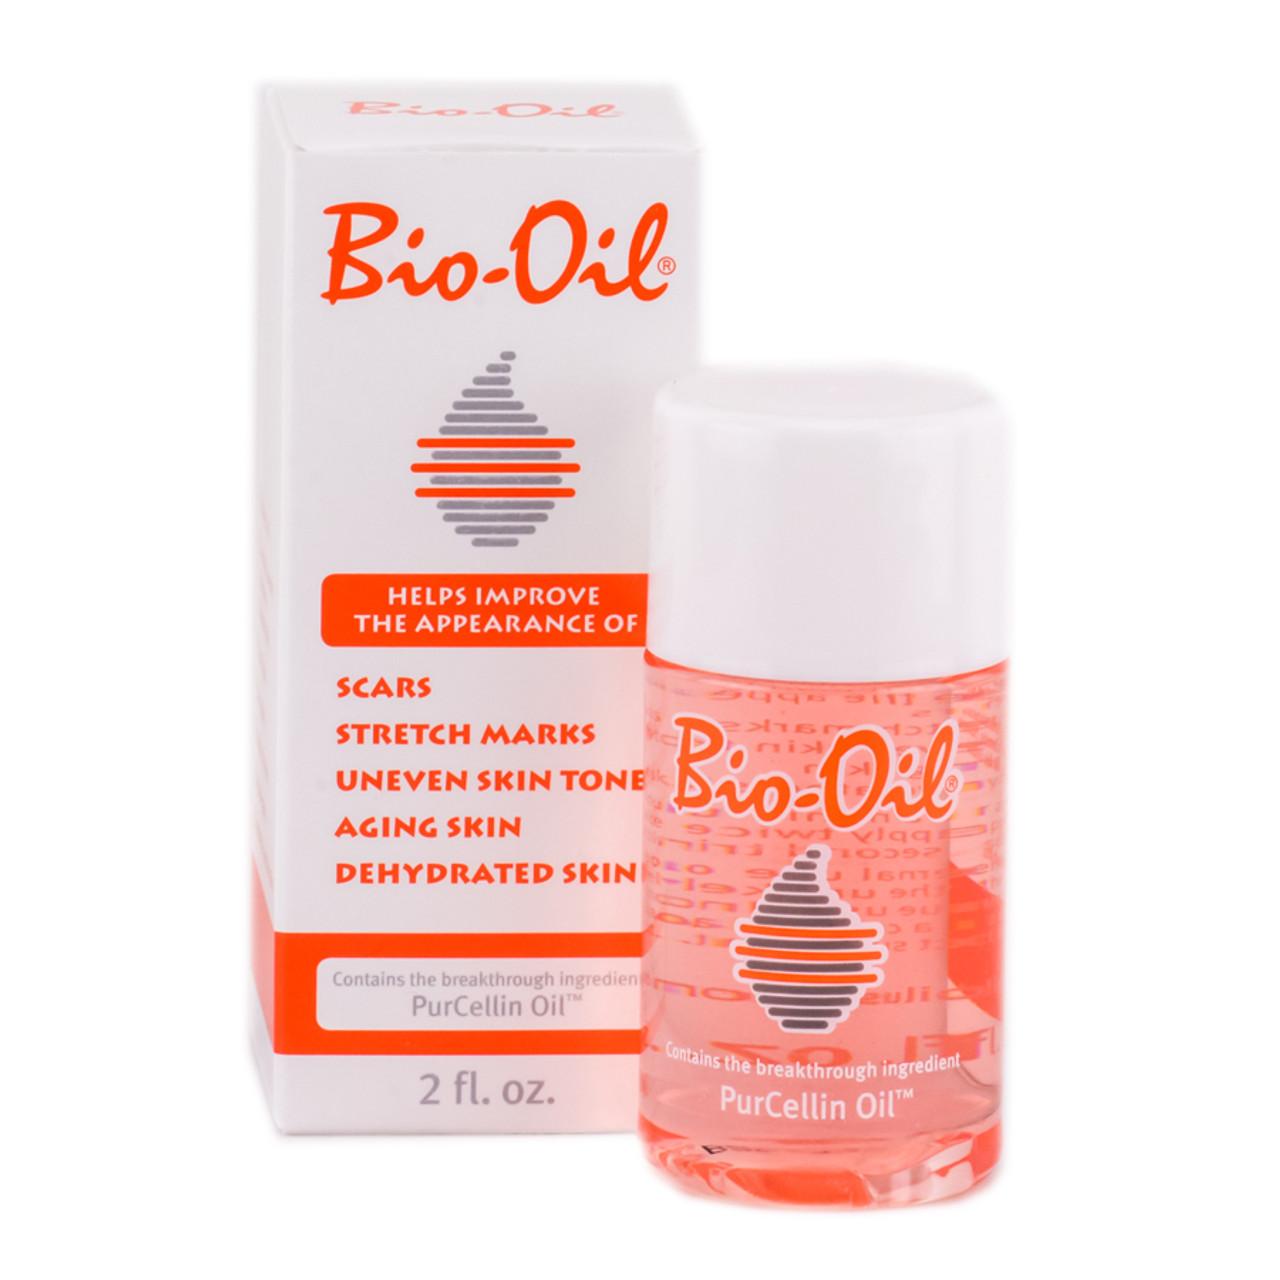 bio oil purcellin oil formerly sleekhair. Black Bedroom Furniture Sets. Home Design Ideas